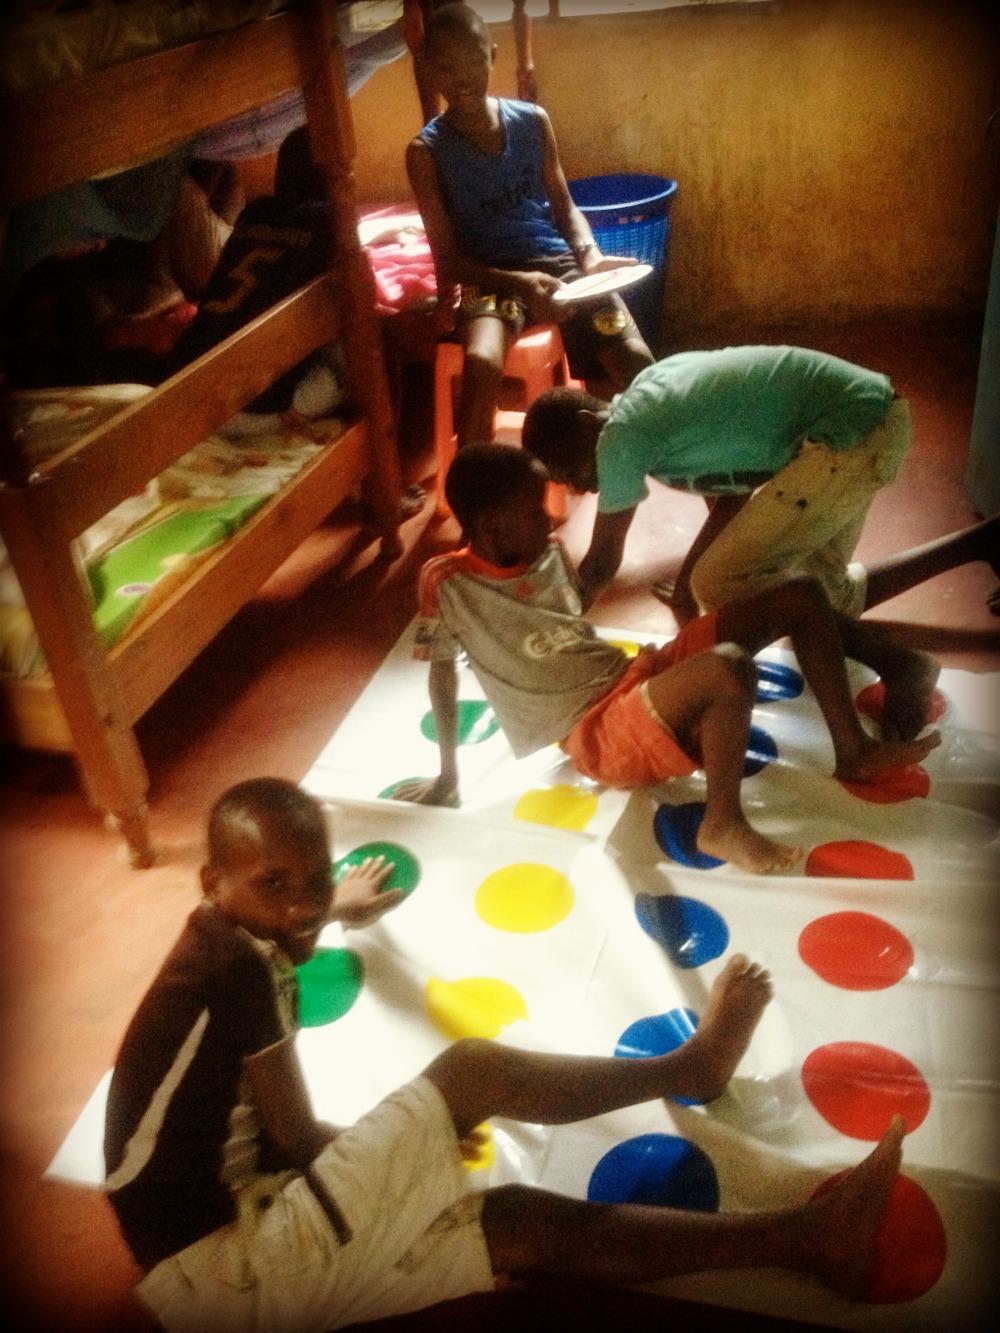 New Hope Childrens home Twister Volunteering i-to-i Africa Kenya Mombasa games